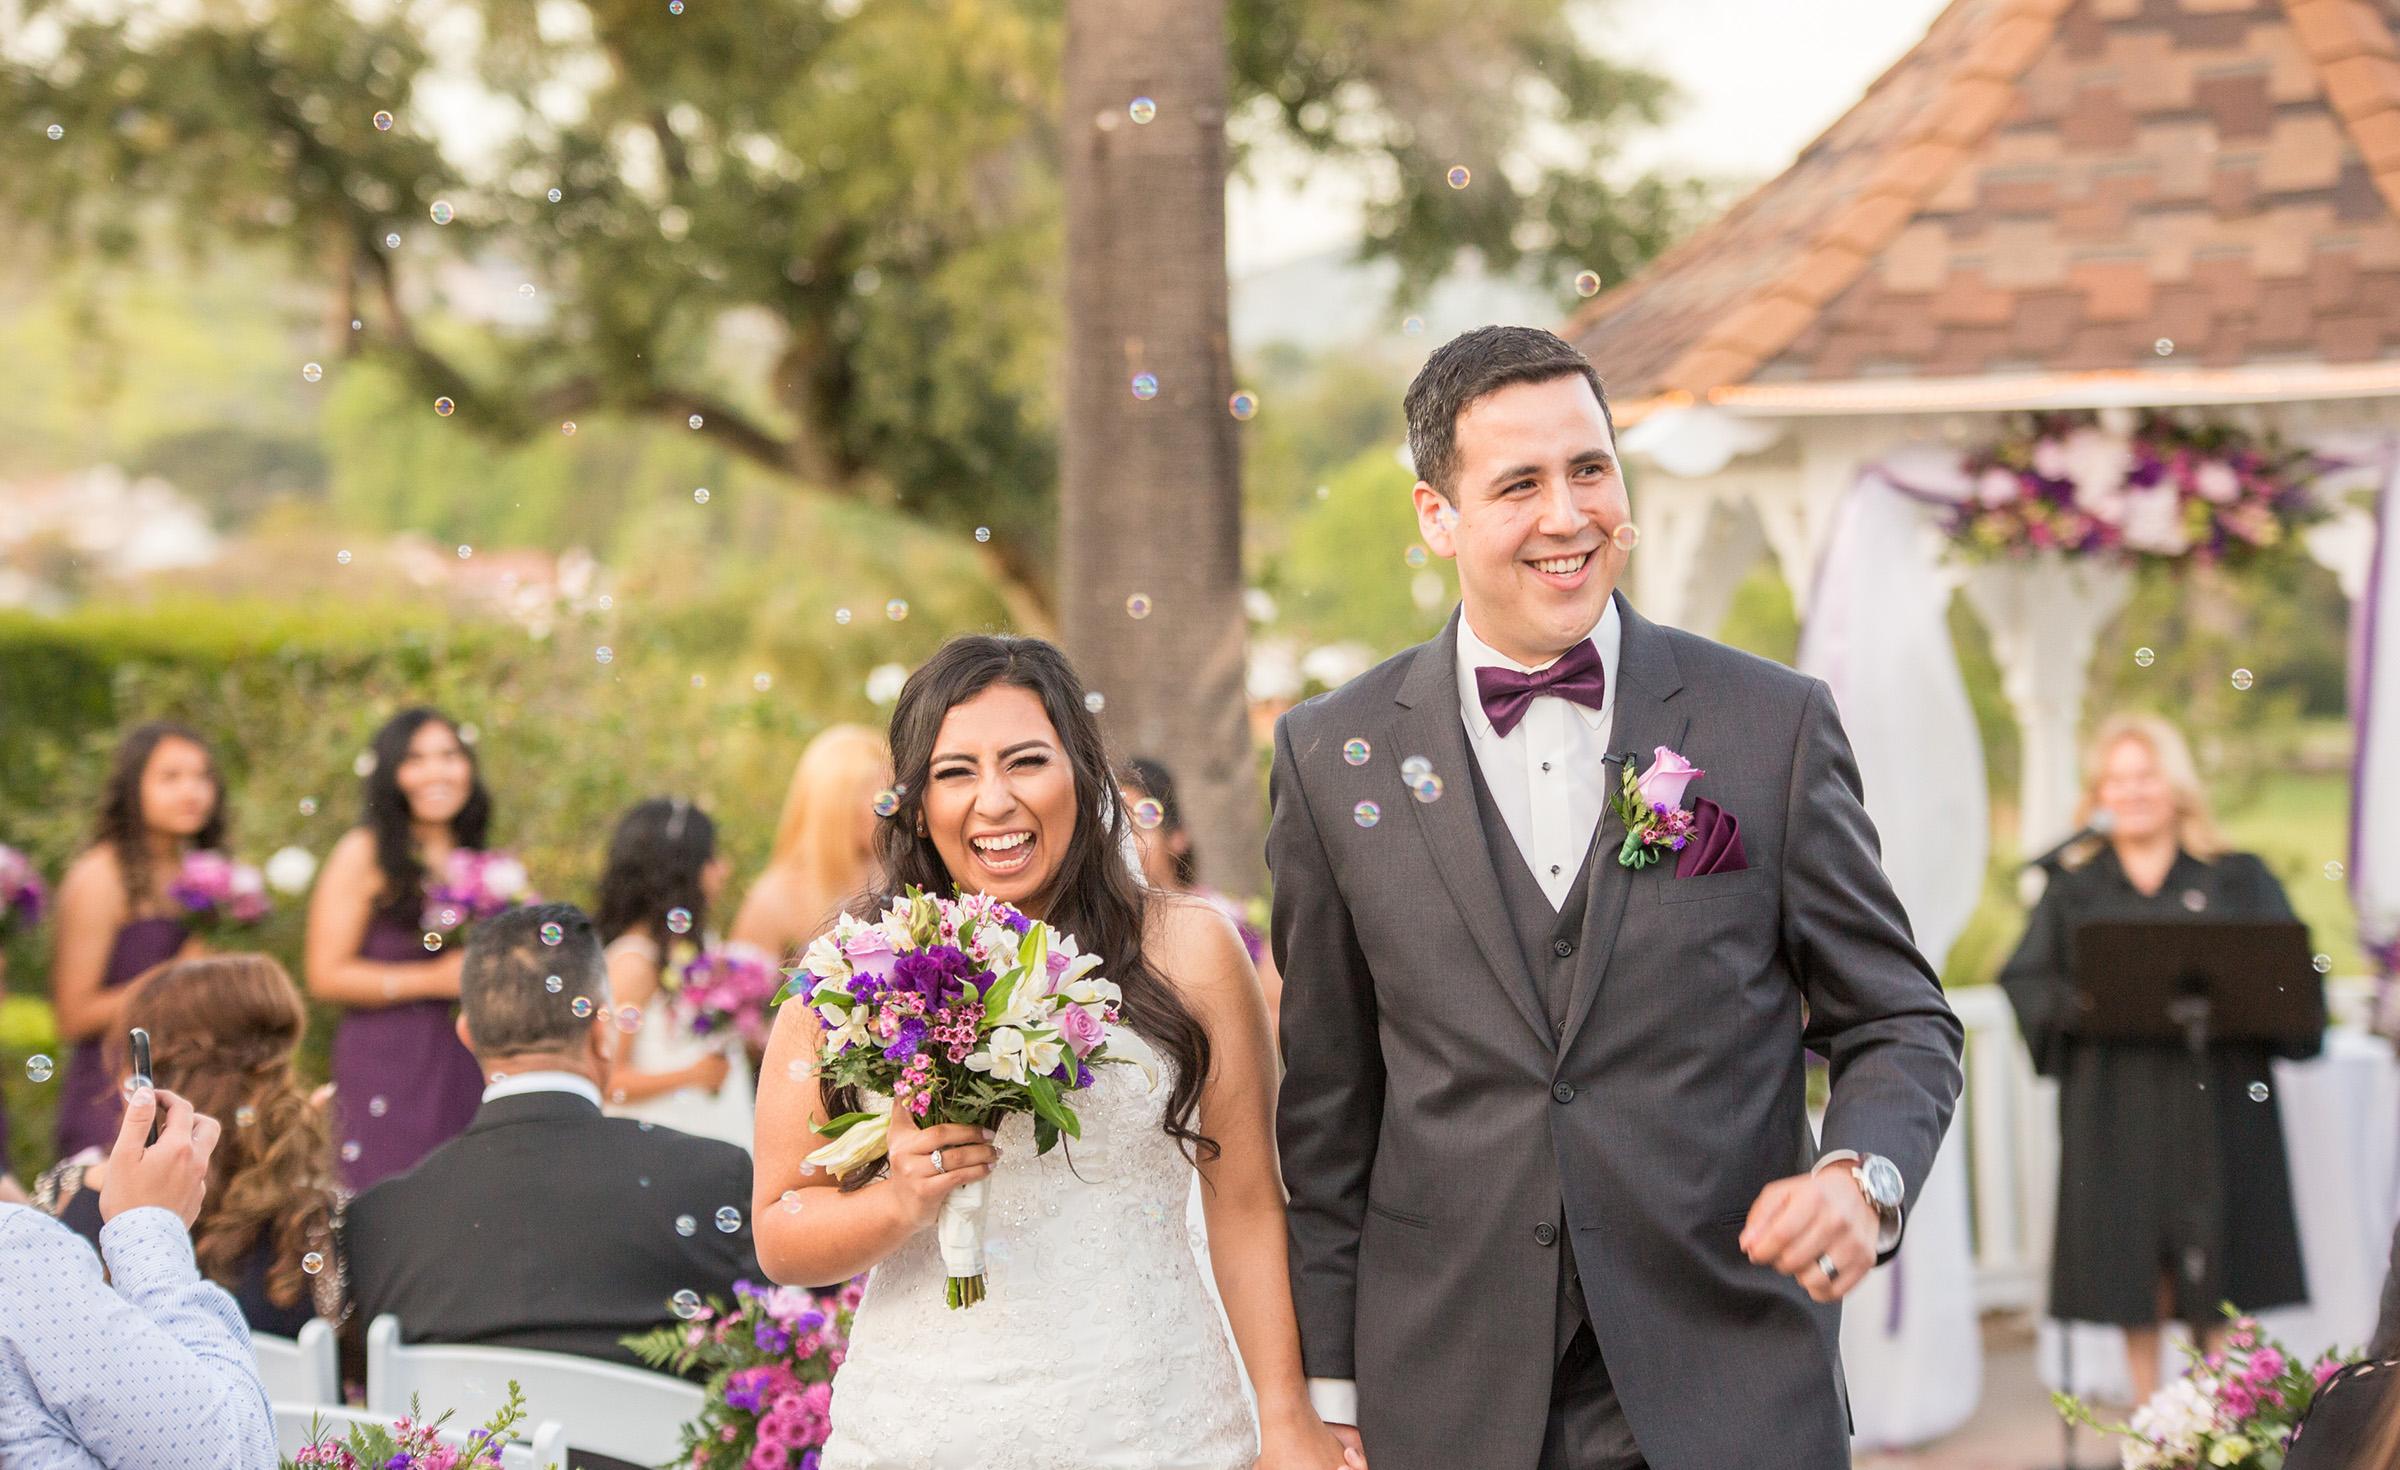 Celebrate your love - Indian Hills - Riverside, California - Riverside County - Wedgewood Weddings